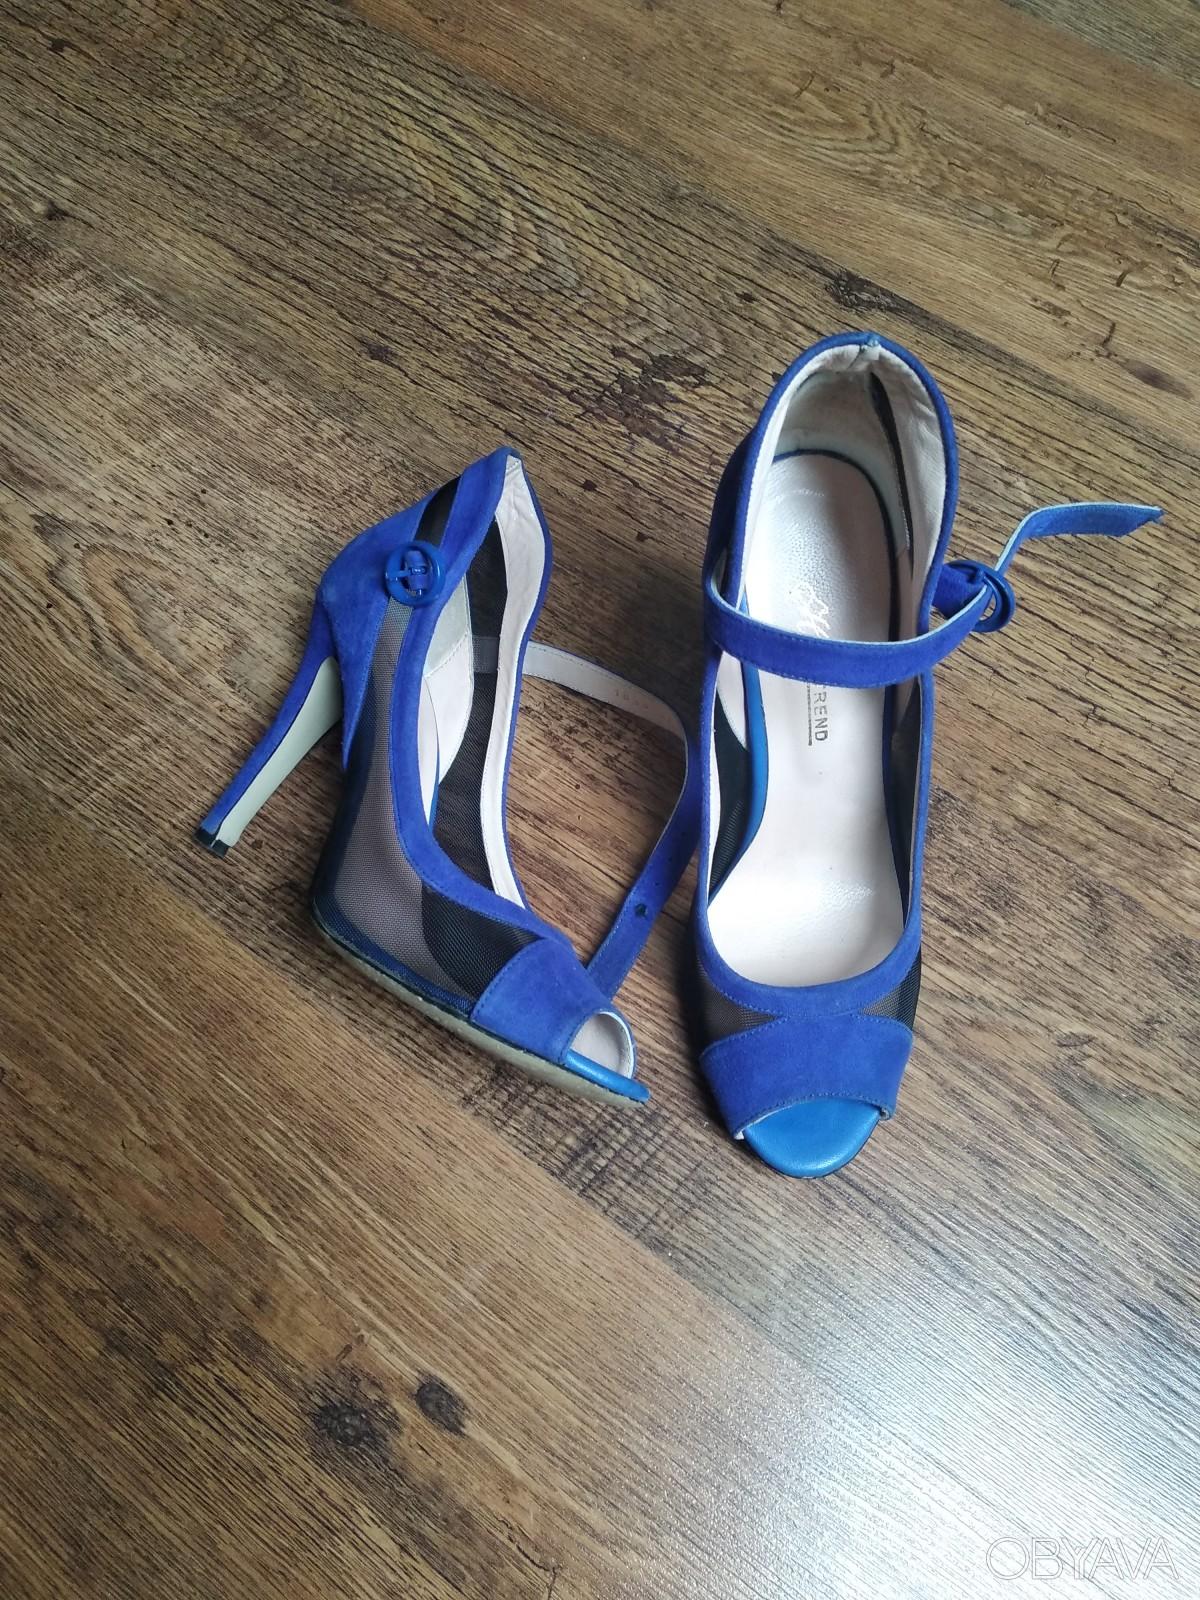 ᐈ Туфлі сині замшеві ᐈ Жмеринка 500 ГРН - OBYAVA.ua™ №2911225 afcdd2dbe6c32